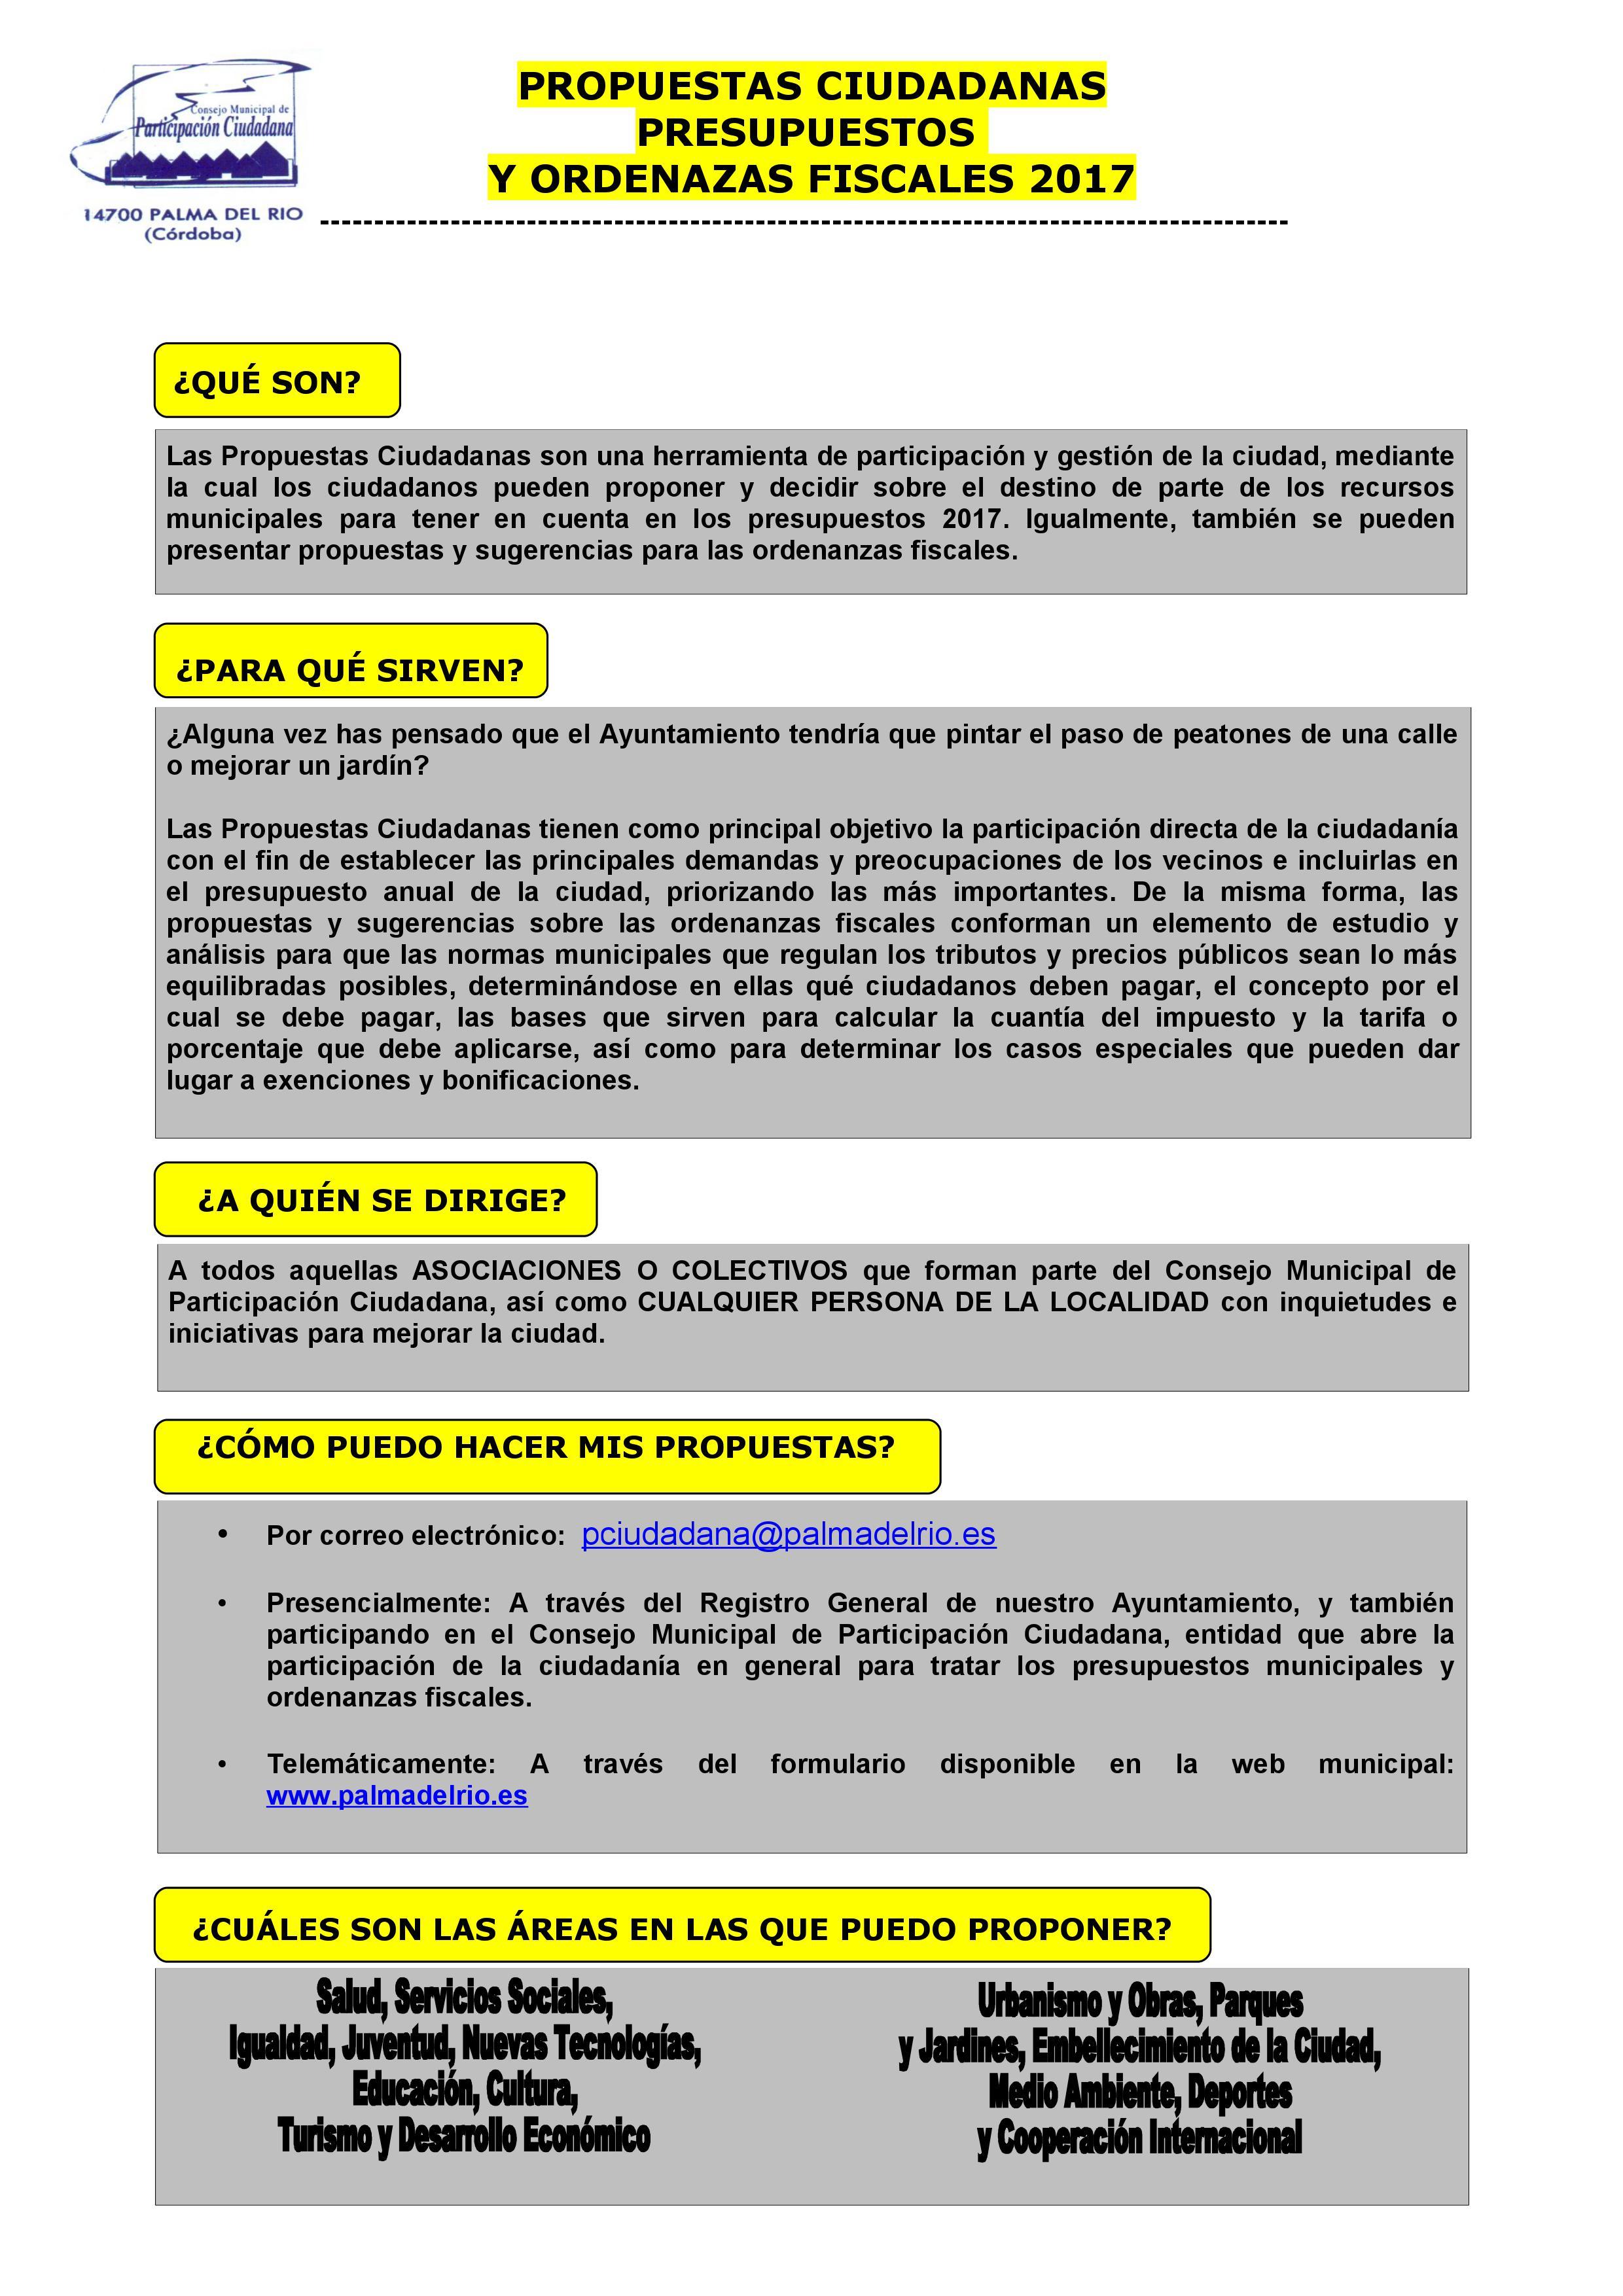 https://www.palmadelrio.es/sites/default/files/herramienta.propuestas_ciudadanas_2017.jpg